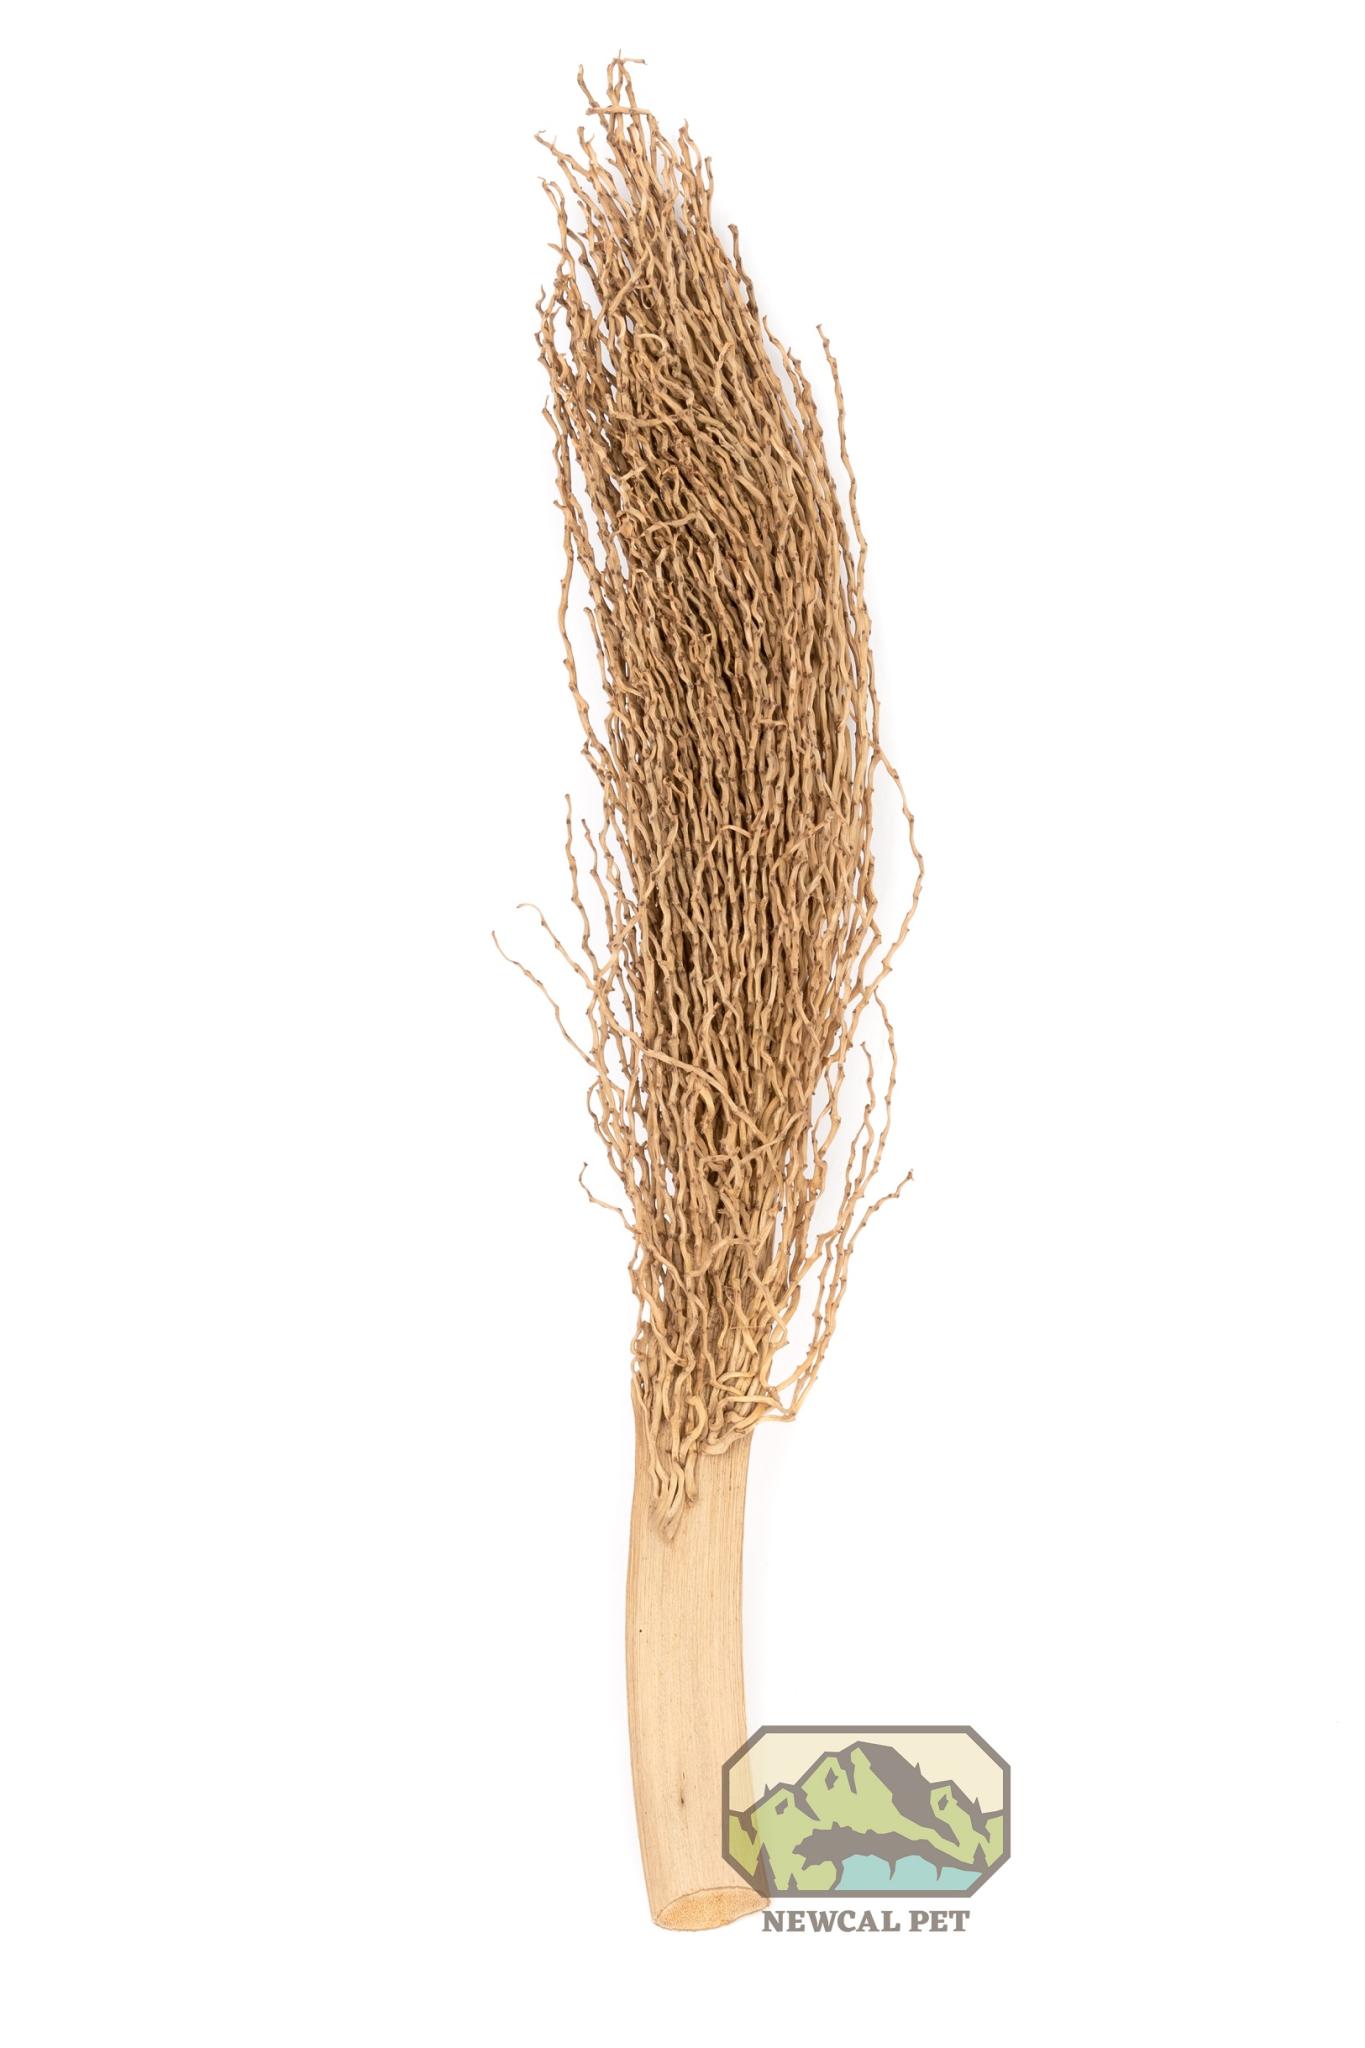 "NewCal Pets Branche de rameau séché 12 po - Palm Torch 12"""